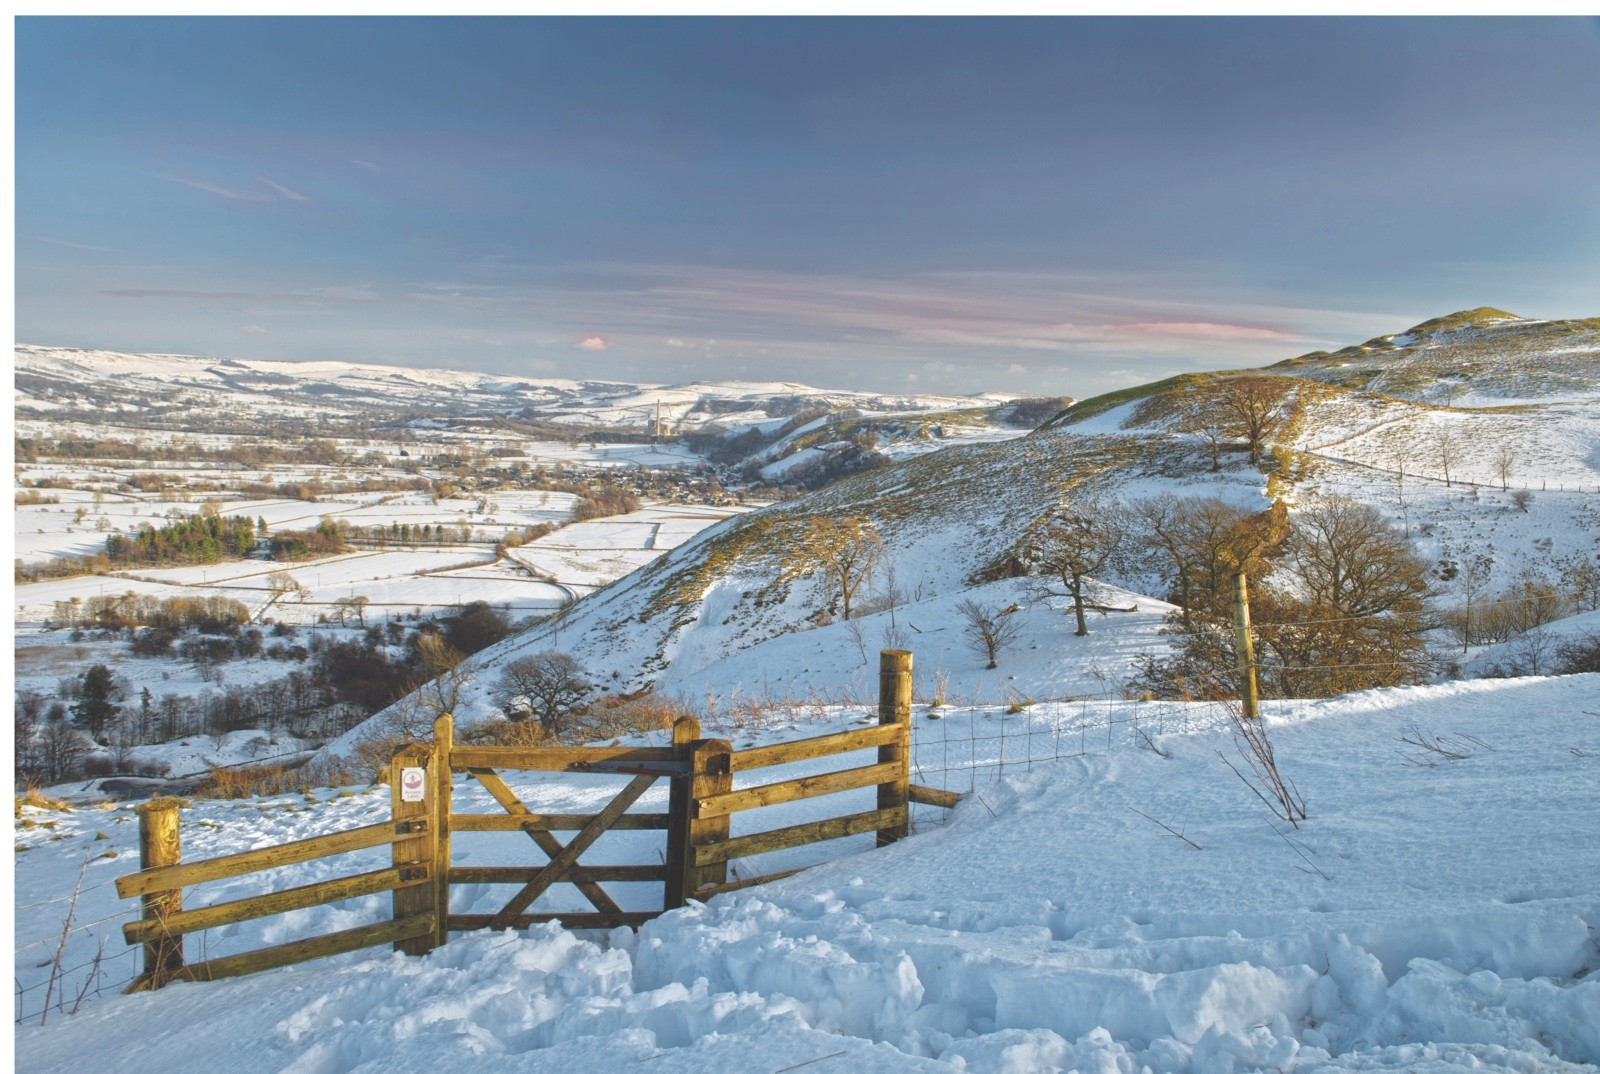 EG05EA Landscape of  Castleton and  The Hope Valley in snow, taken at Blue John Cavern in The Peak District National Park, England. Uk